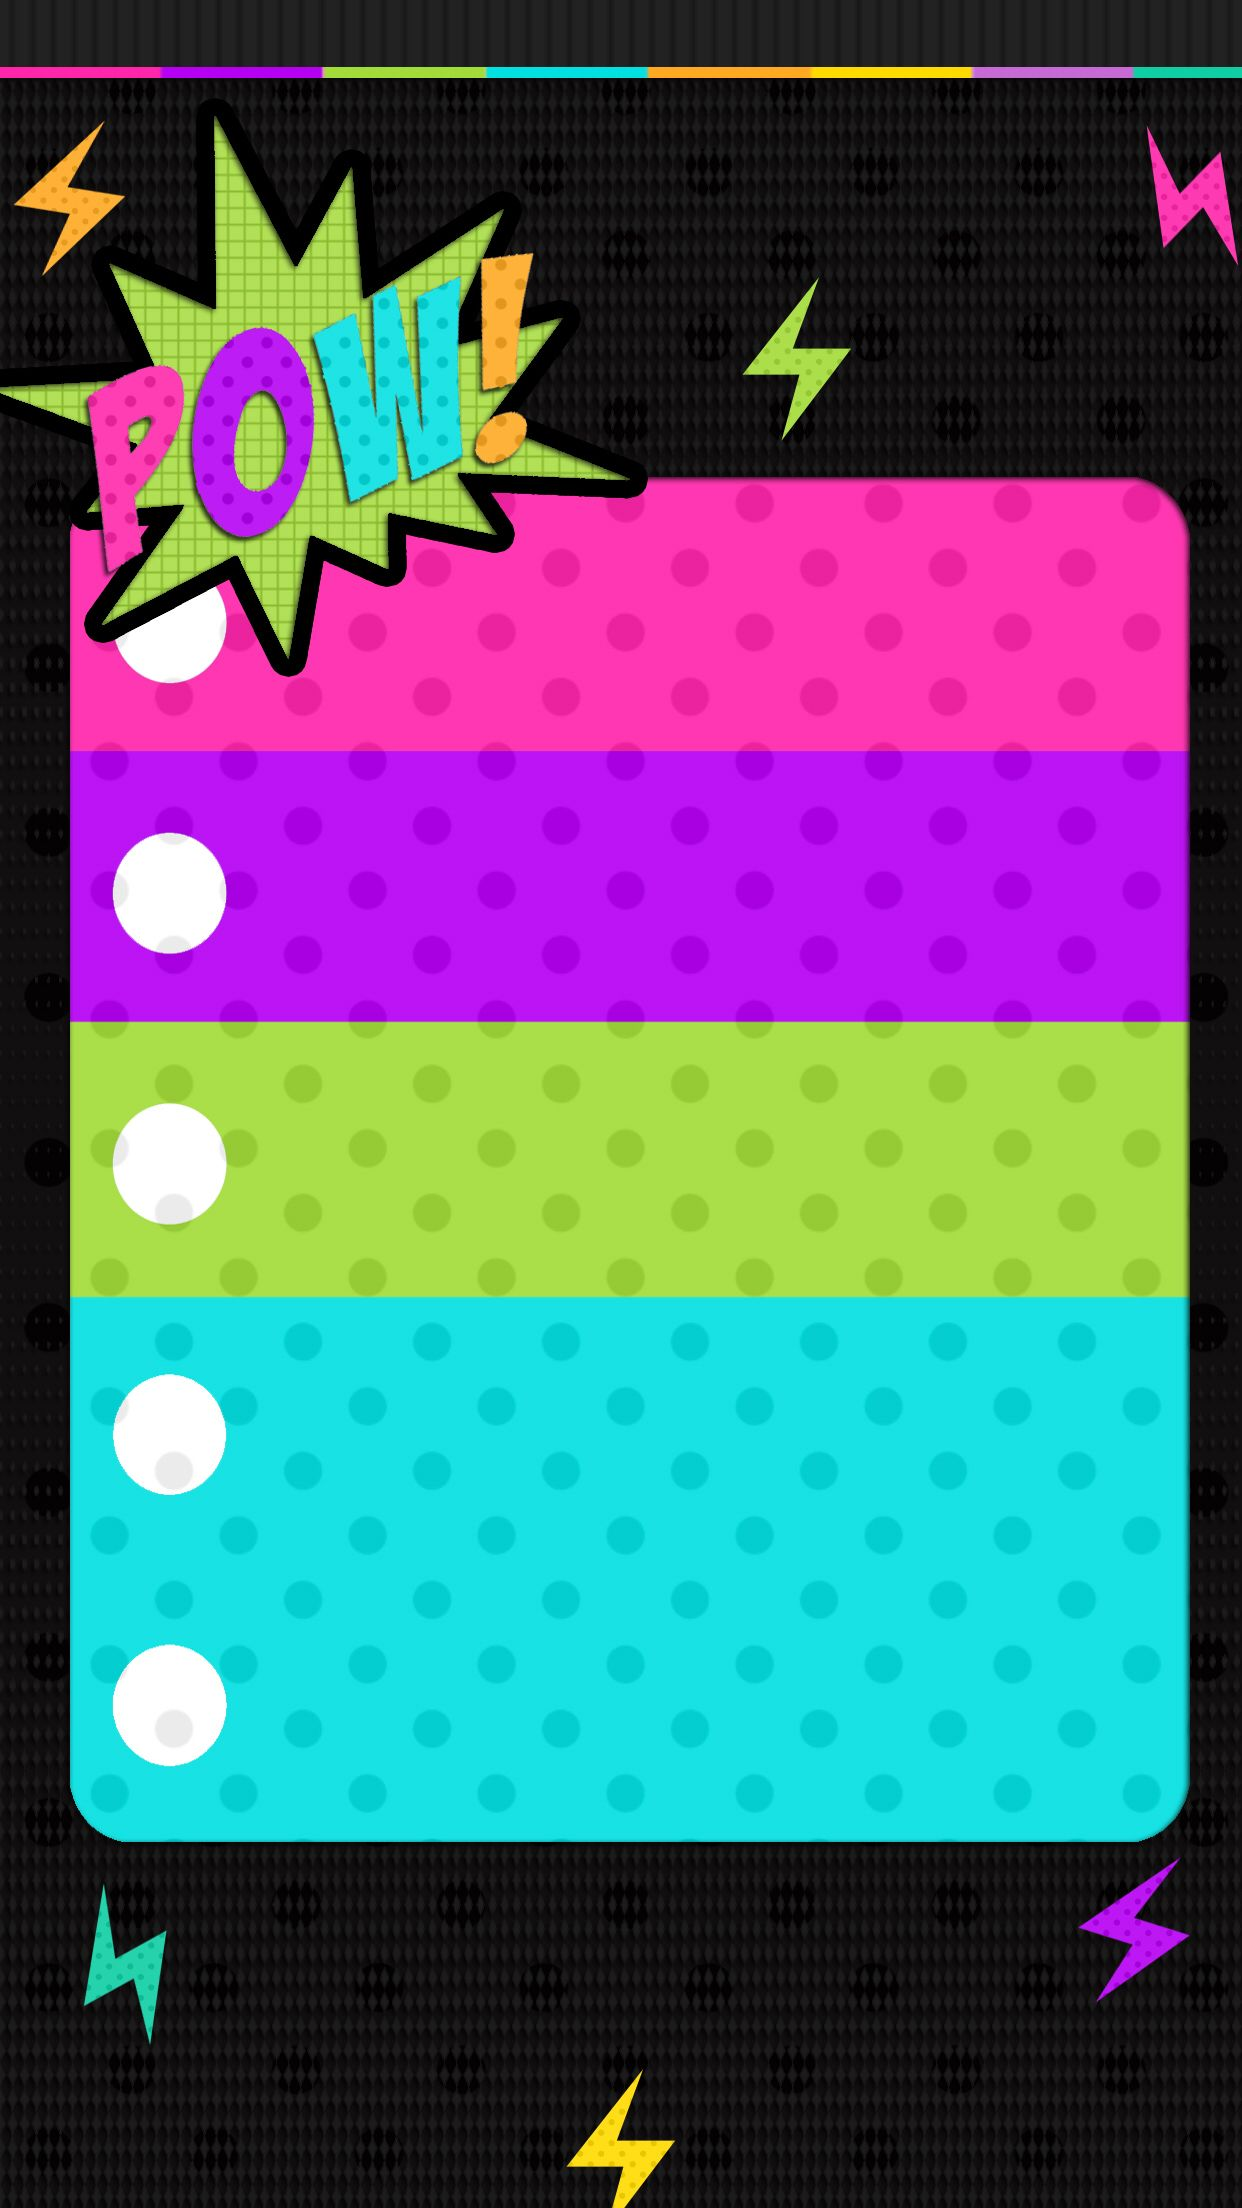 Must see Wallpaper Hello Kitty Neon - 4de323a5d2e4ac238dfa6503a8c3ca05  Gallery_968312.jpg